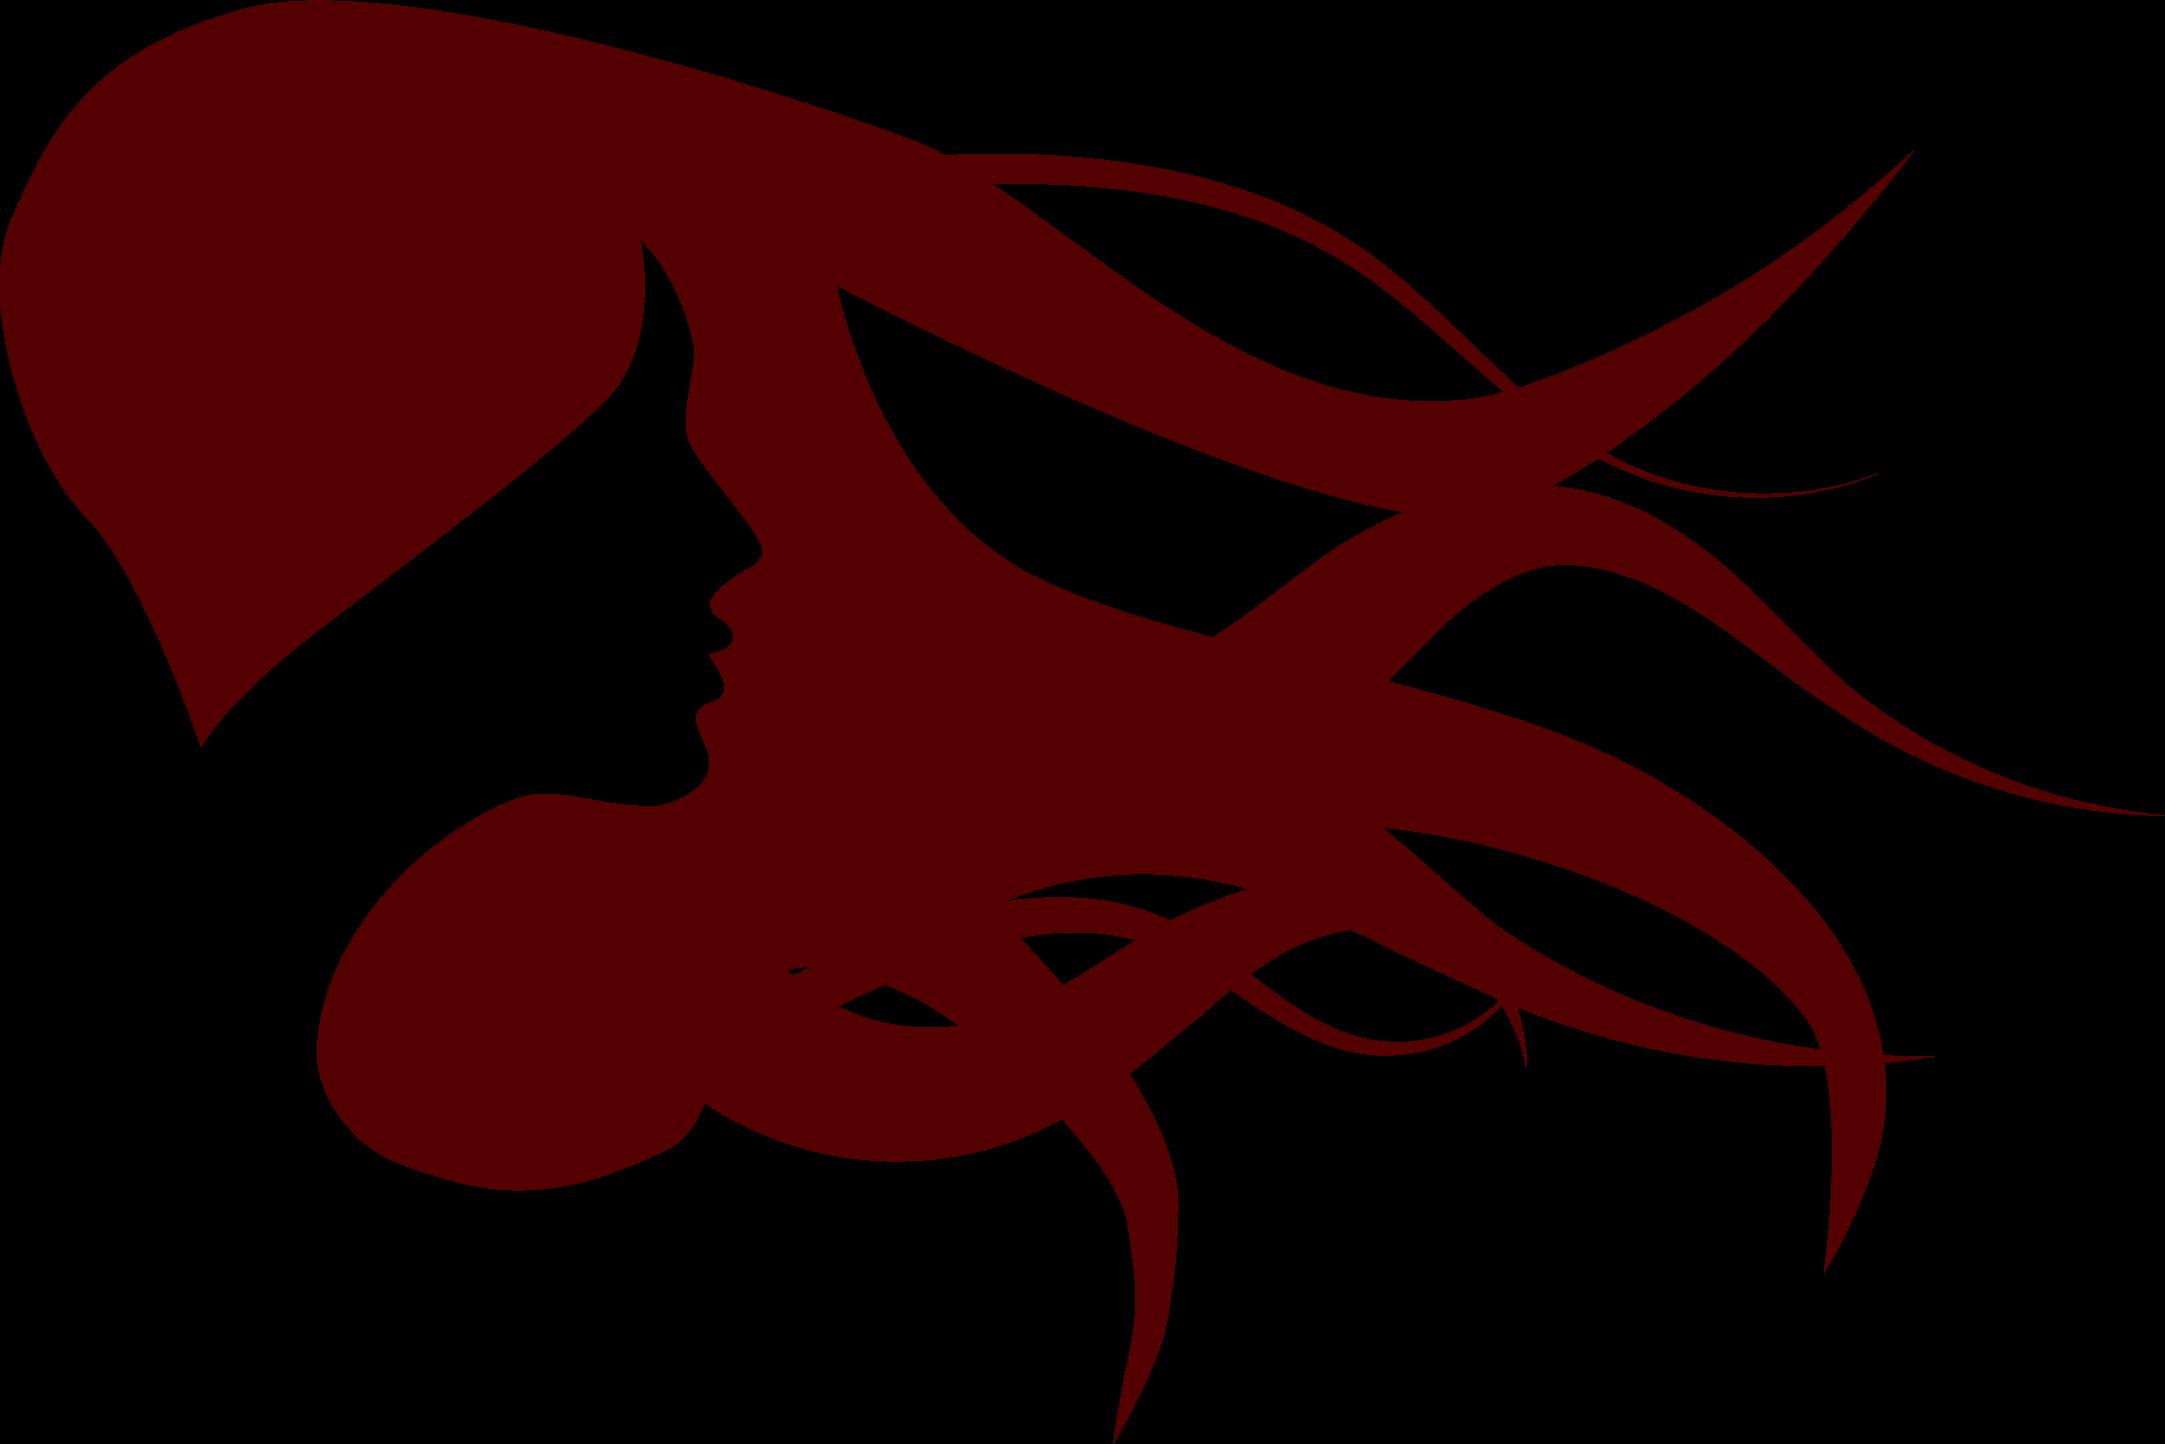 Female silhouette at getdrawings. Clipart girl long hair